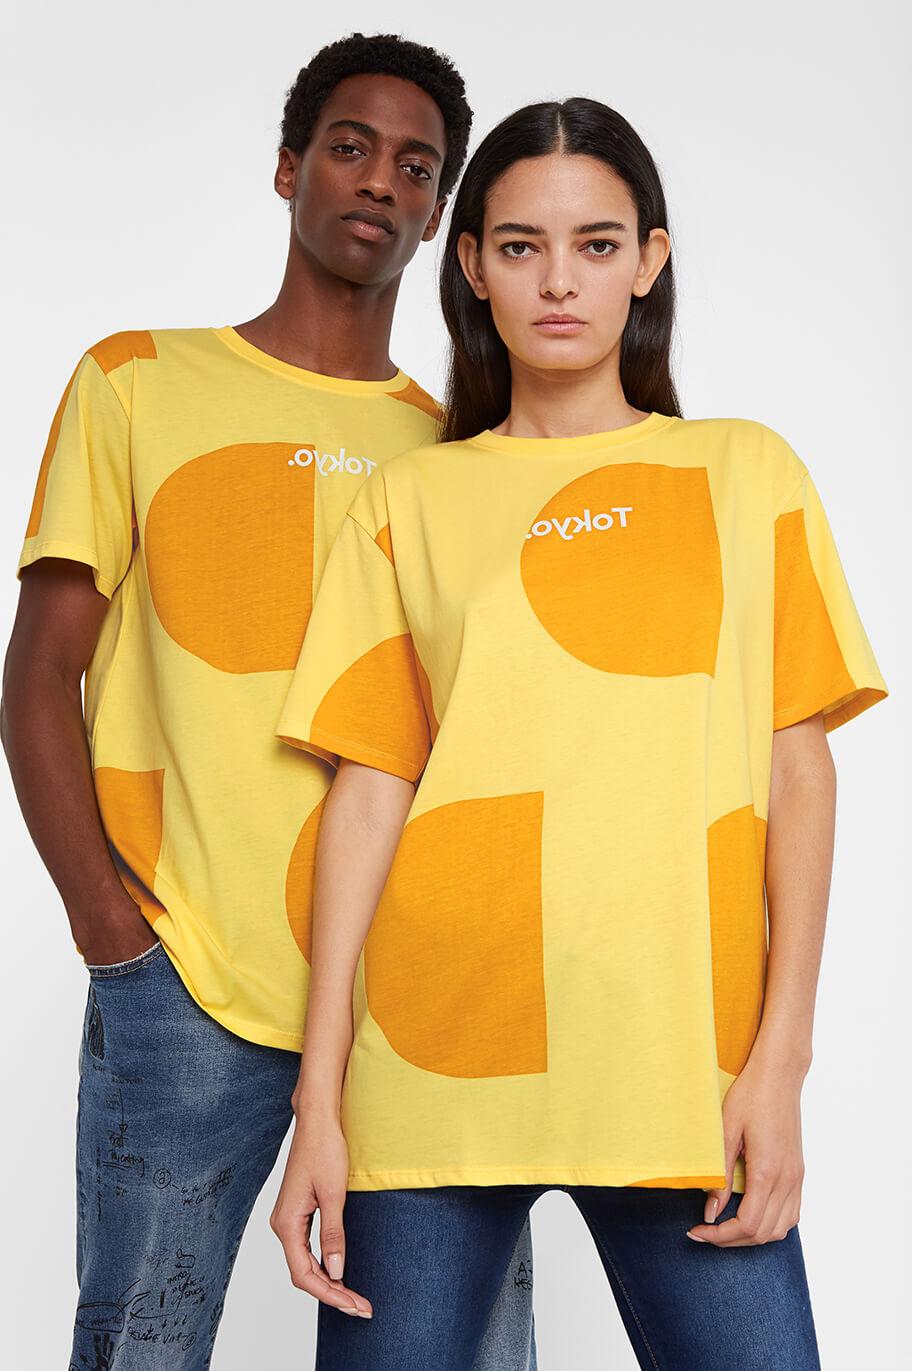 Tokyo Monogram T-shirt